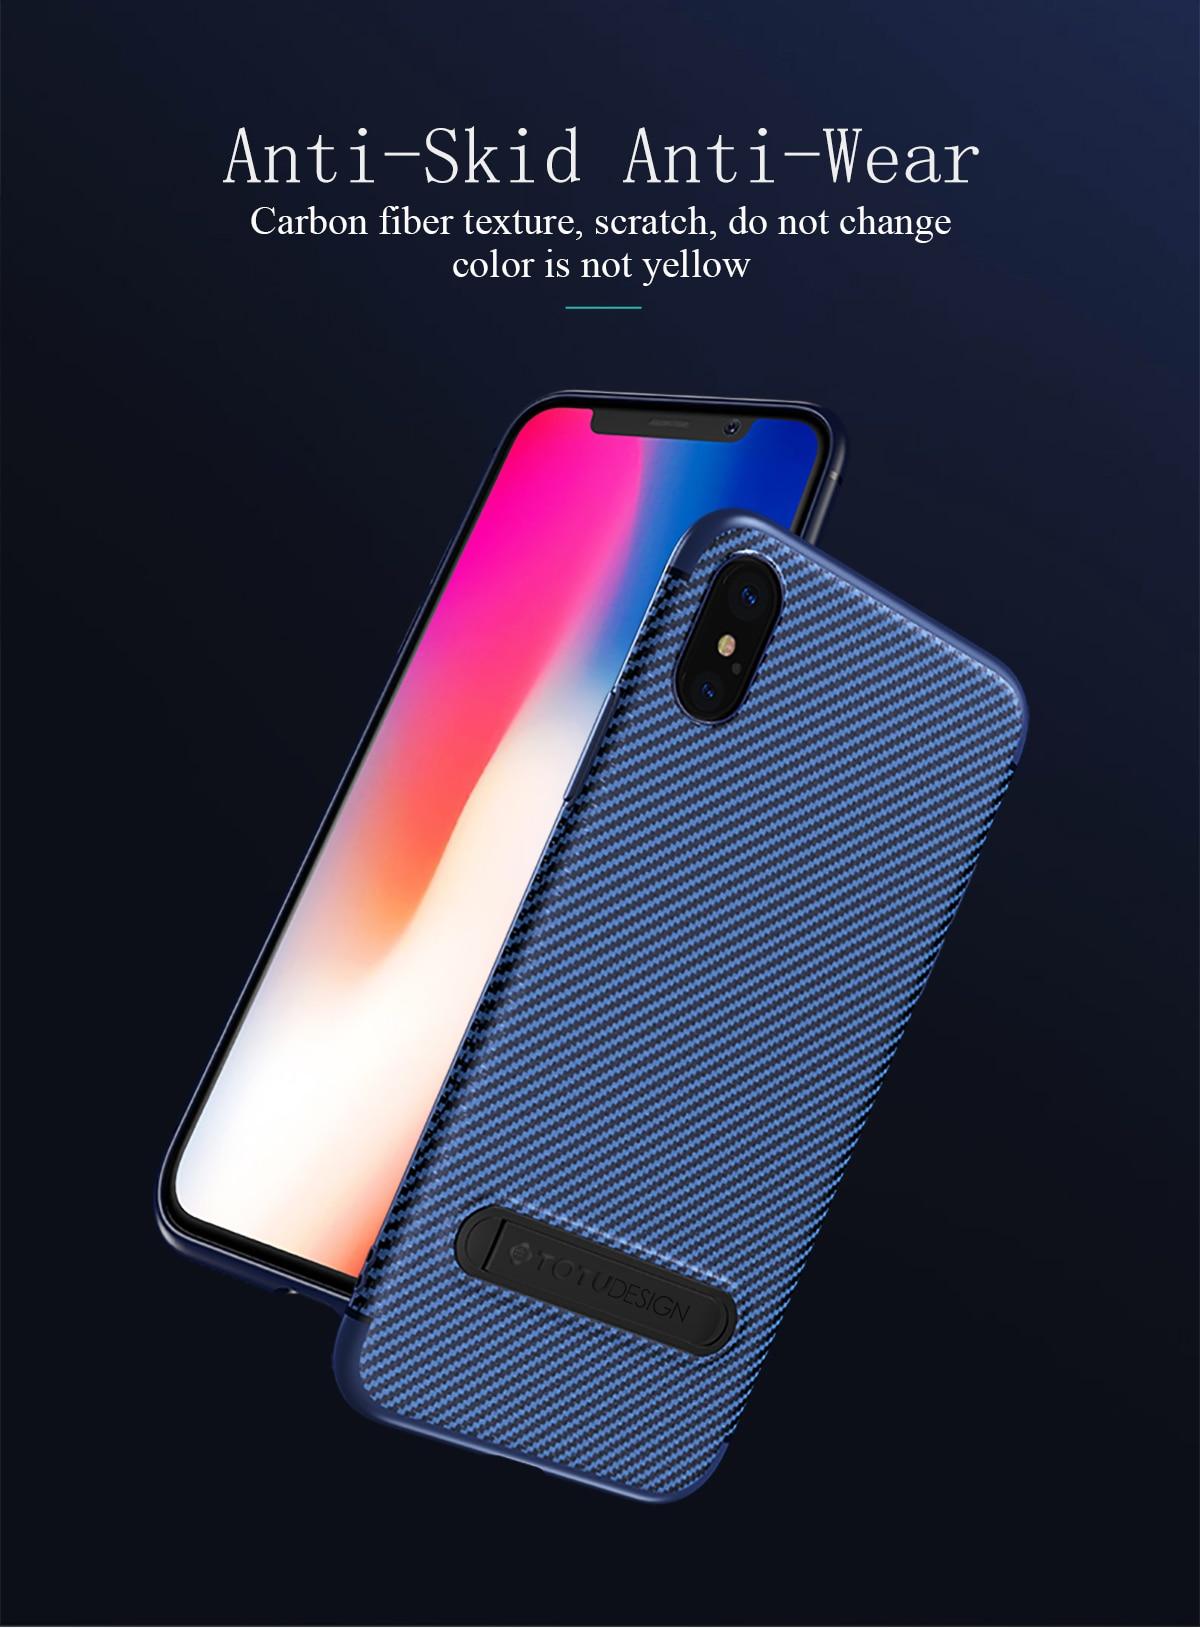 Carbon Fiber Case For Iphone X 8 7 Plustotu Luxury Plus Totu Design Crystal Color Dark Blue Product Description